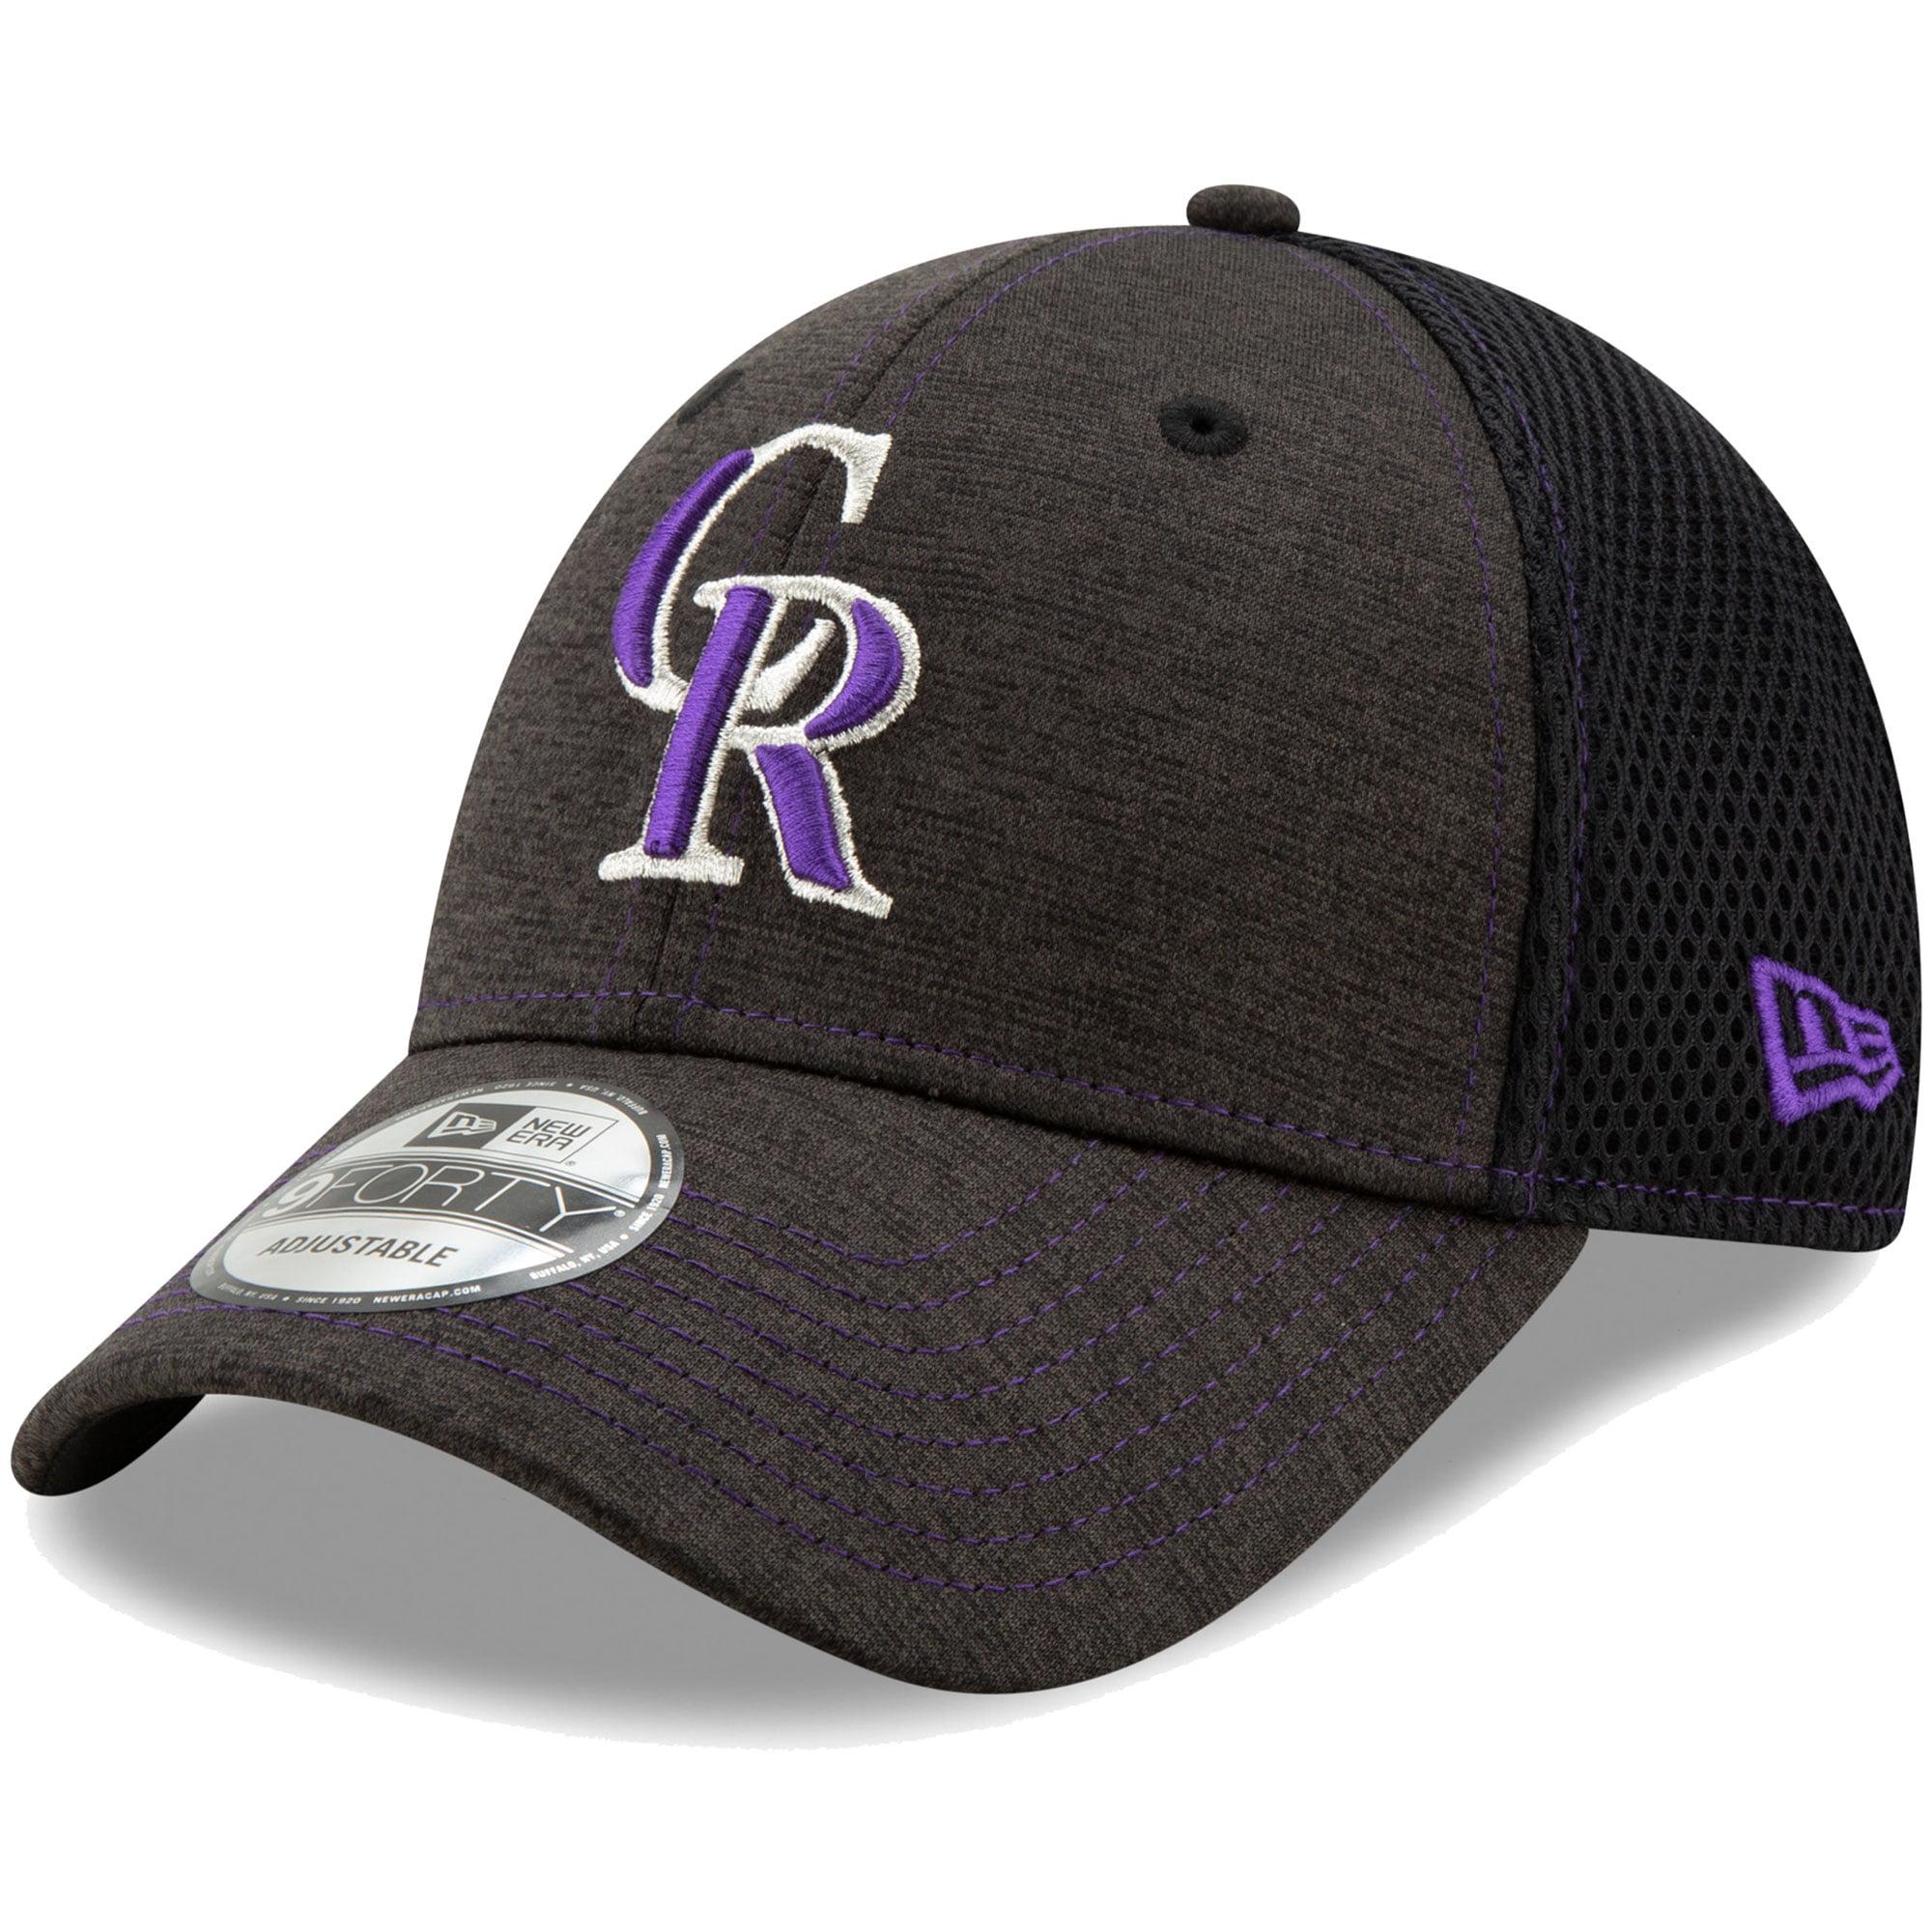 Colorado Rockies New Era Youth Team Tread 9FORTY Adjustable Hat - Heathered Black - OSFA